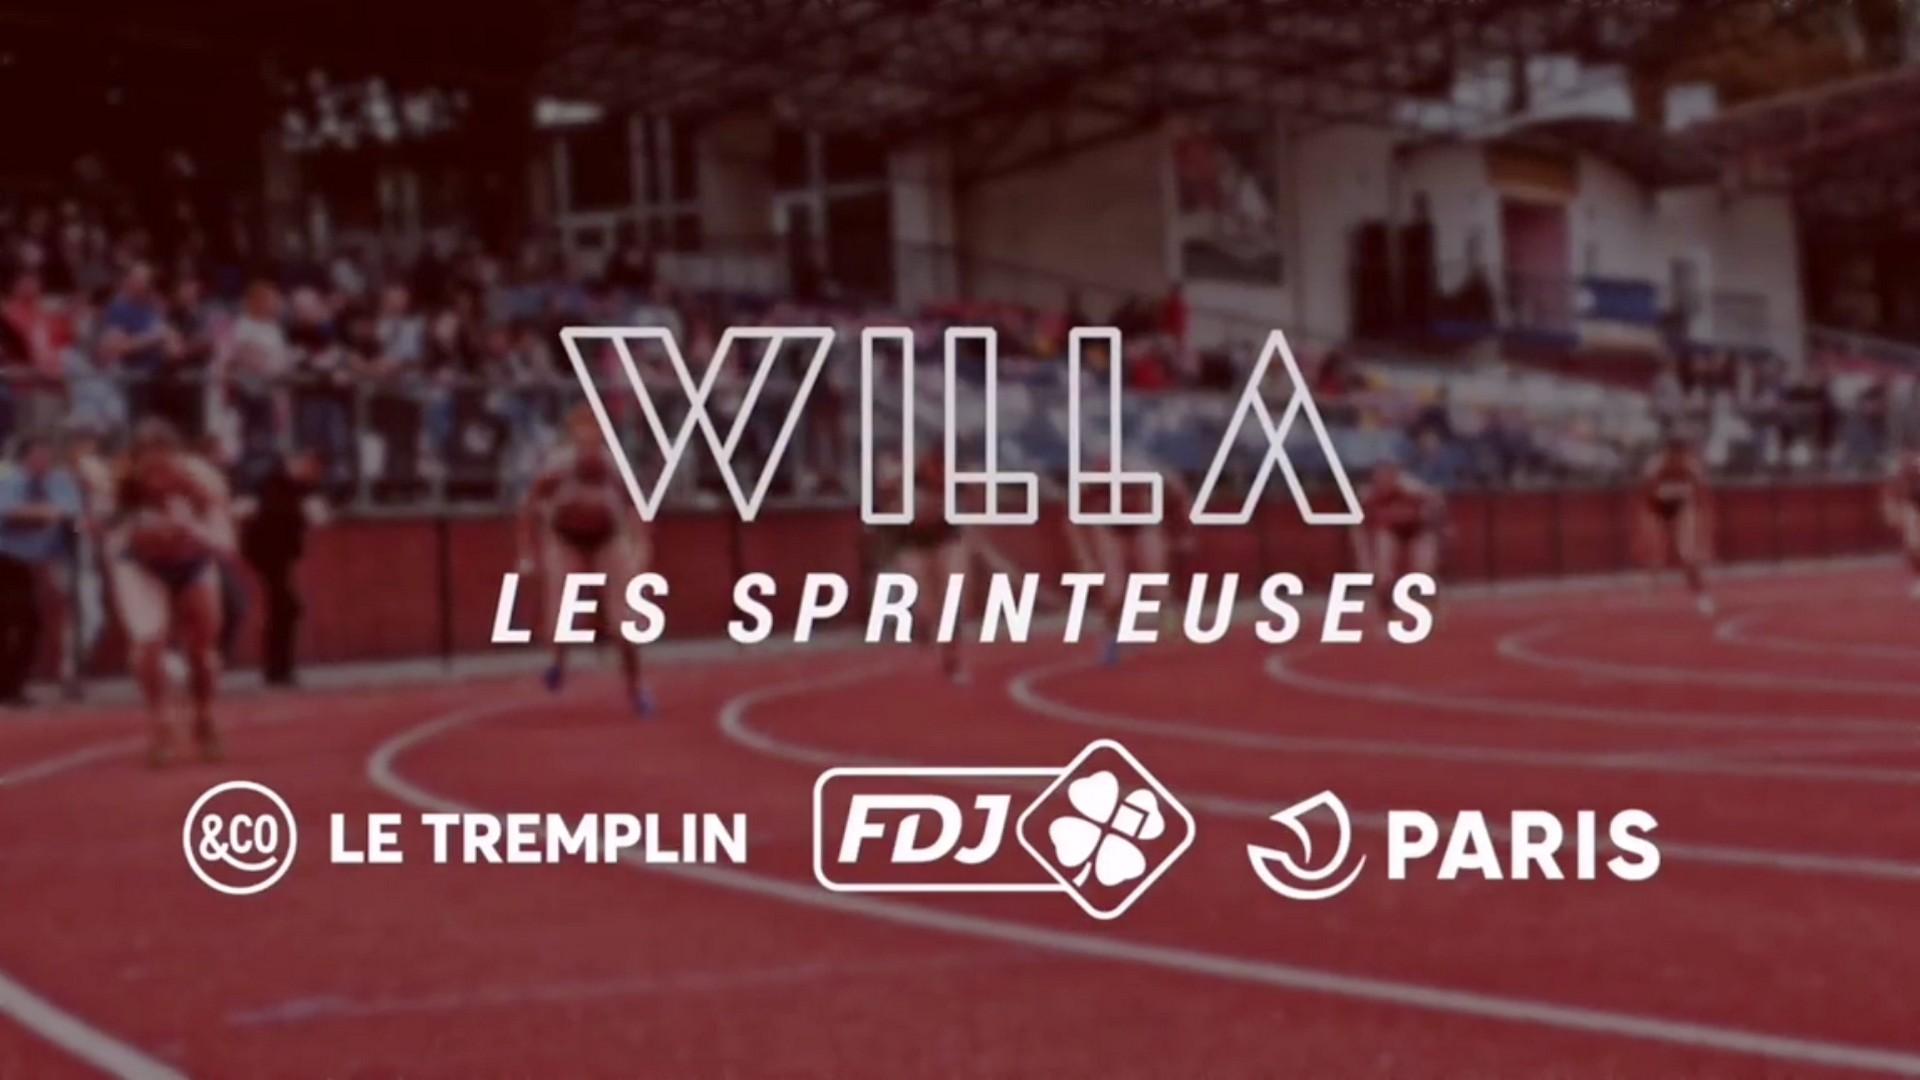 Willa Les Sprinteuses